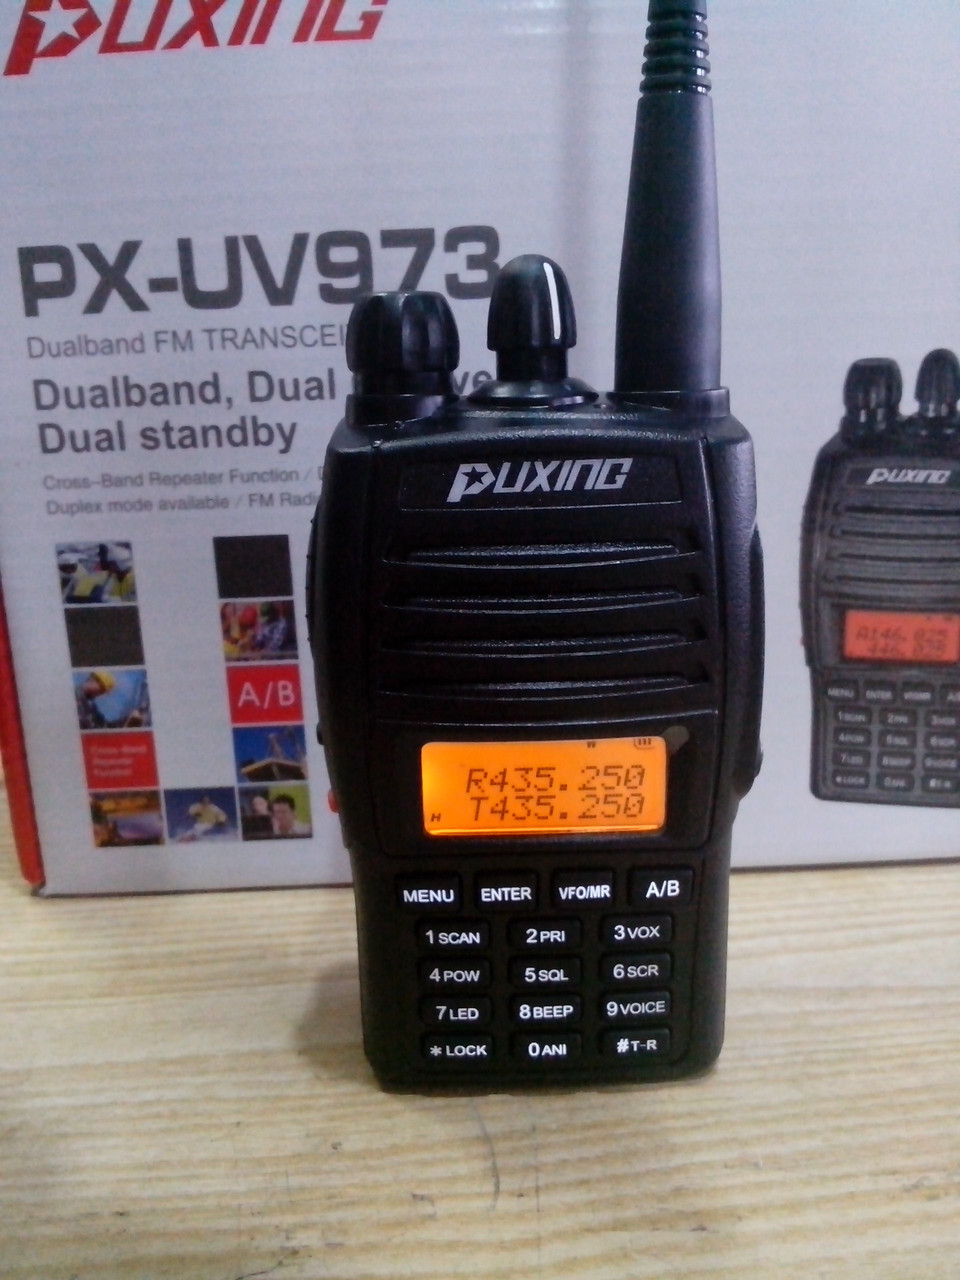 Puxing PX-UV973 (PX-UV9R), скремблер, дуплекс, кросс-бенд, радиостанция